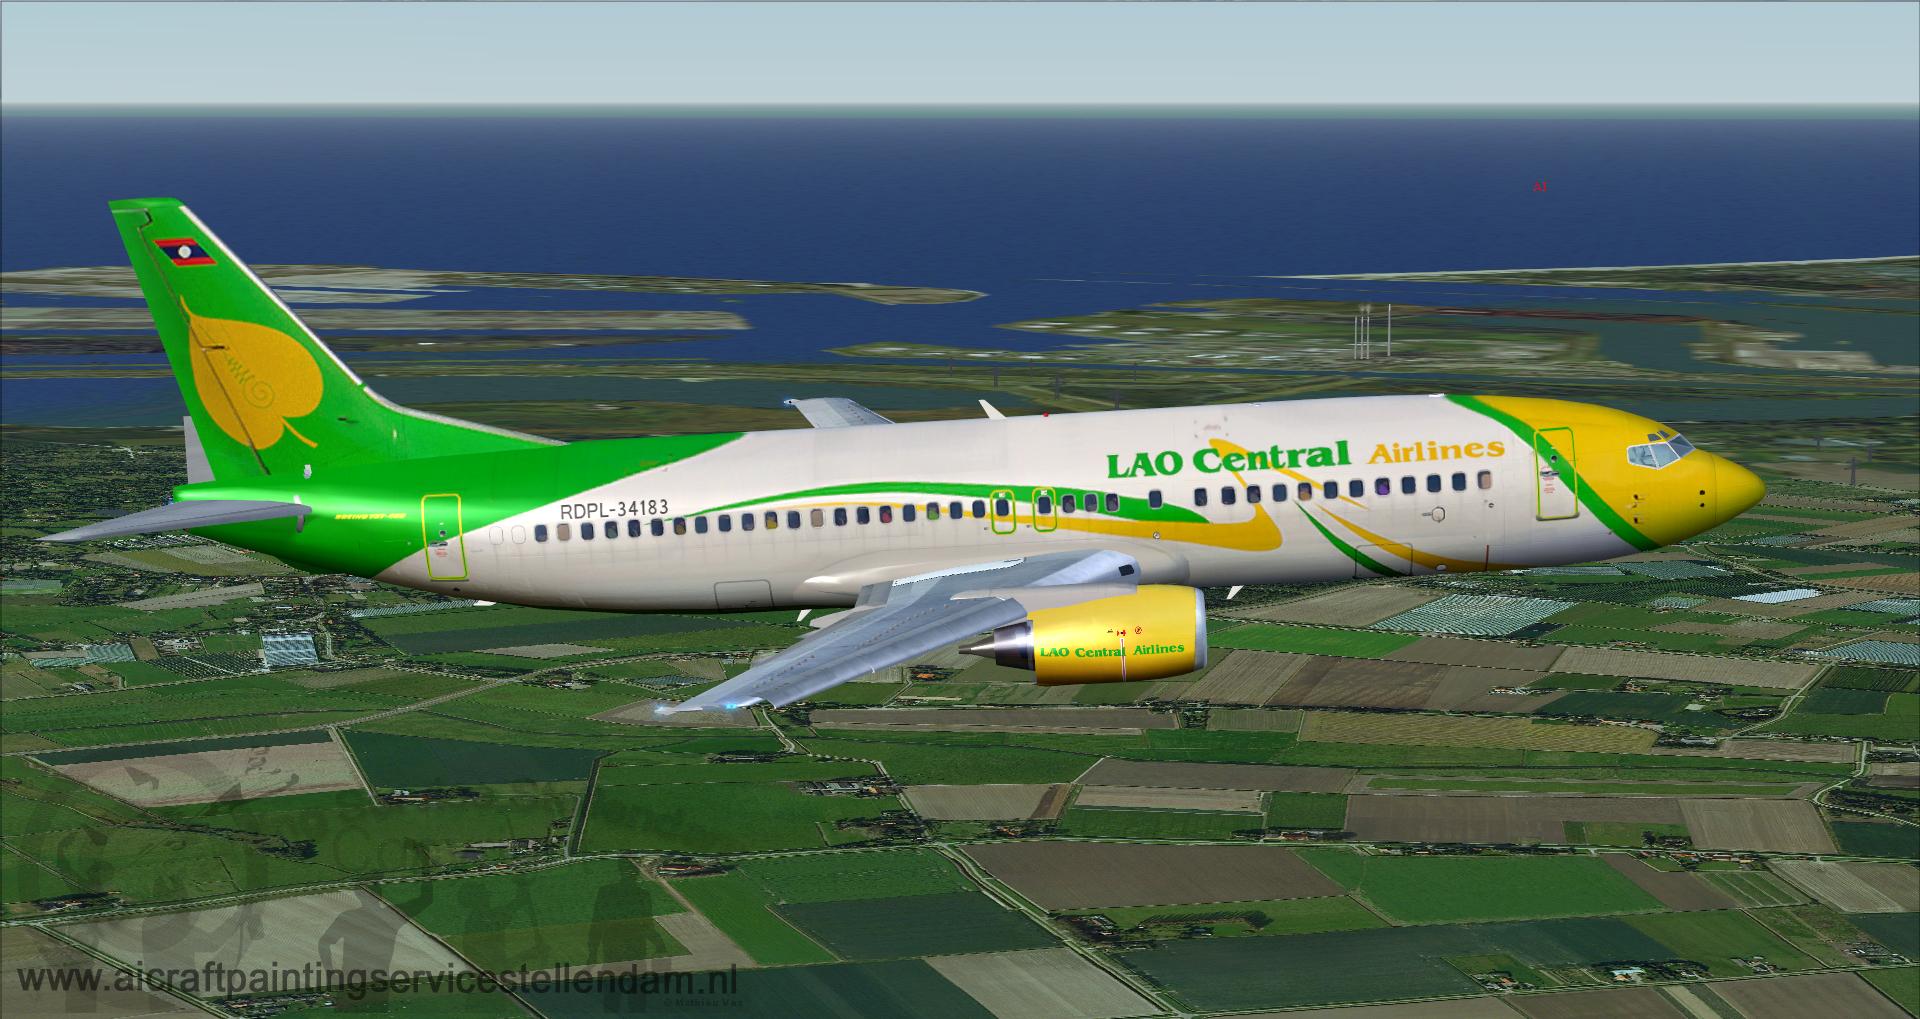 VistalinersB737-400LaoCentralAirlines_RDPL-34183_4